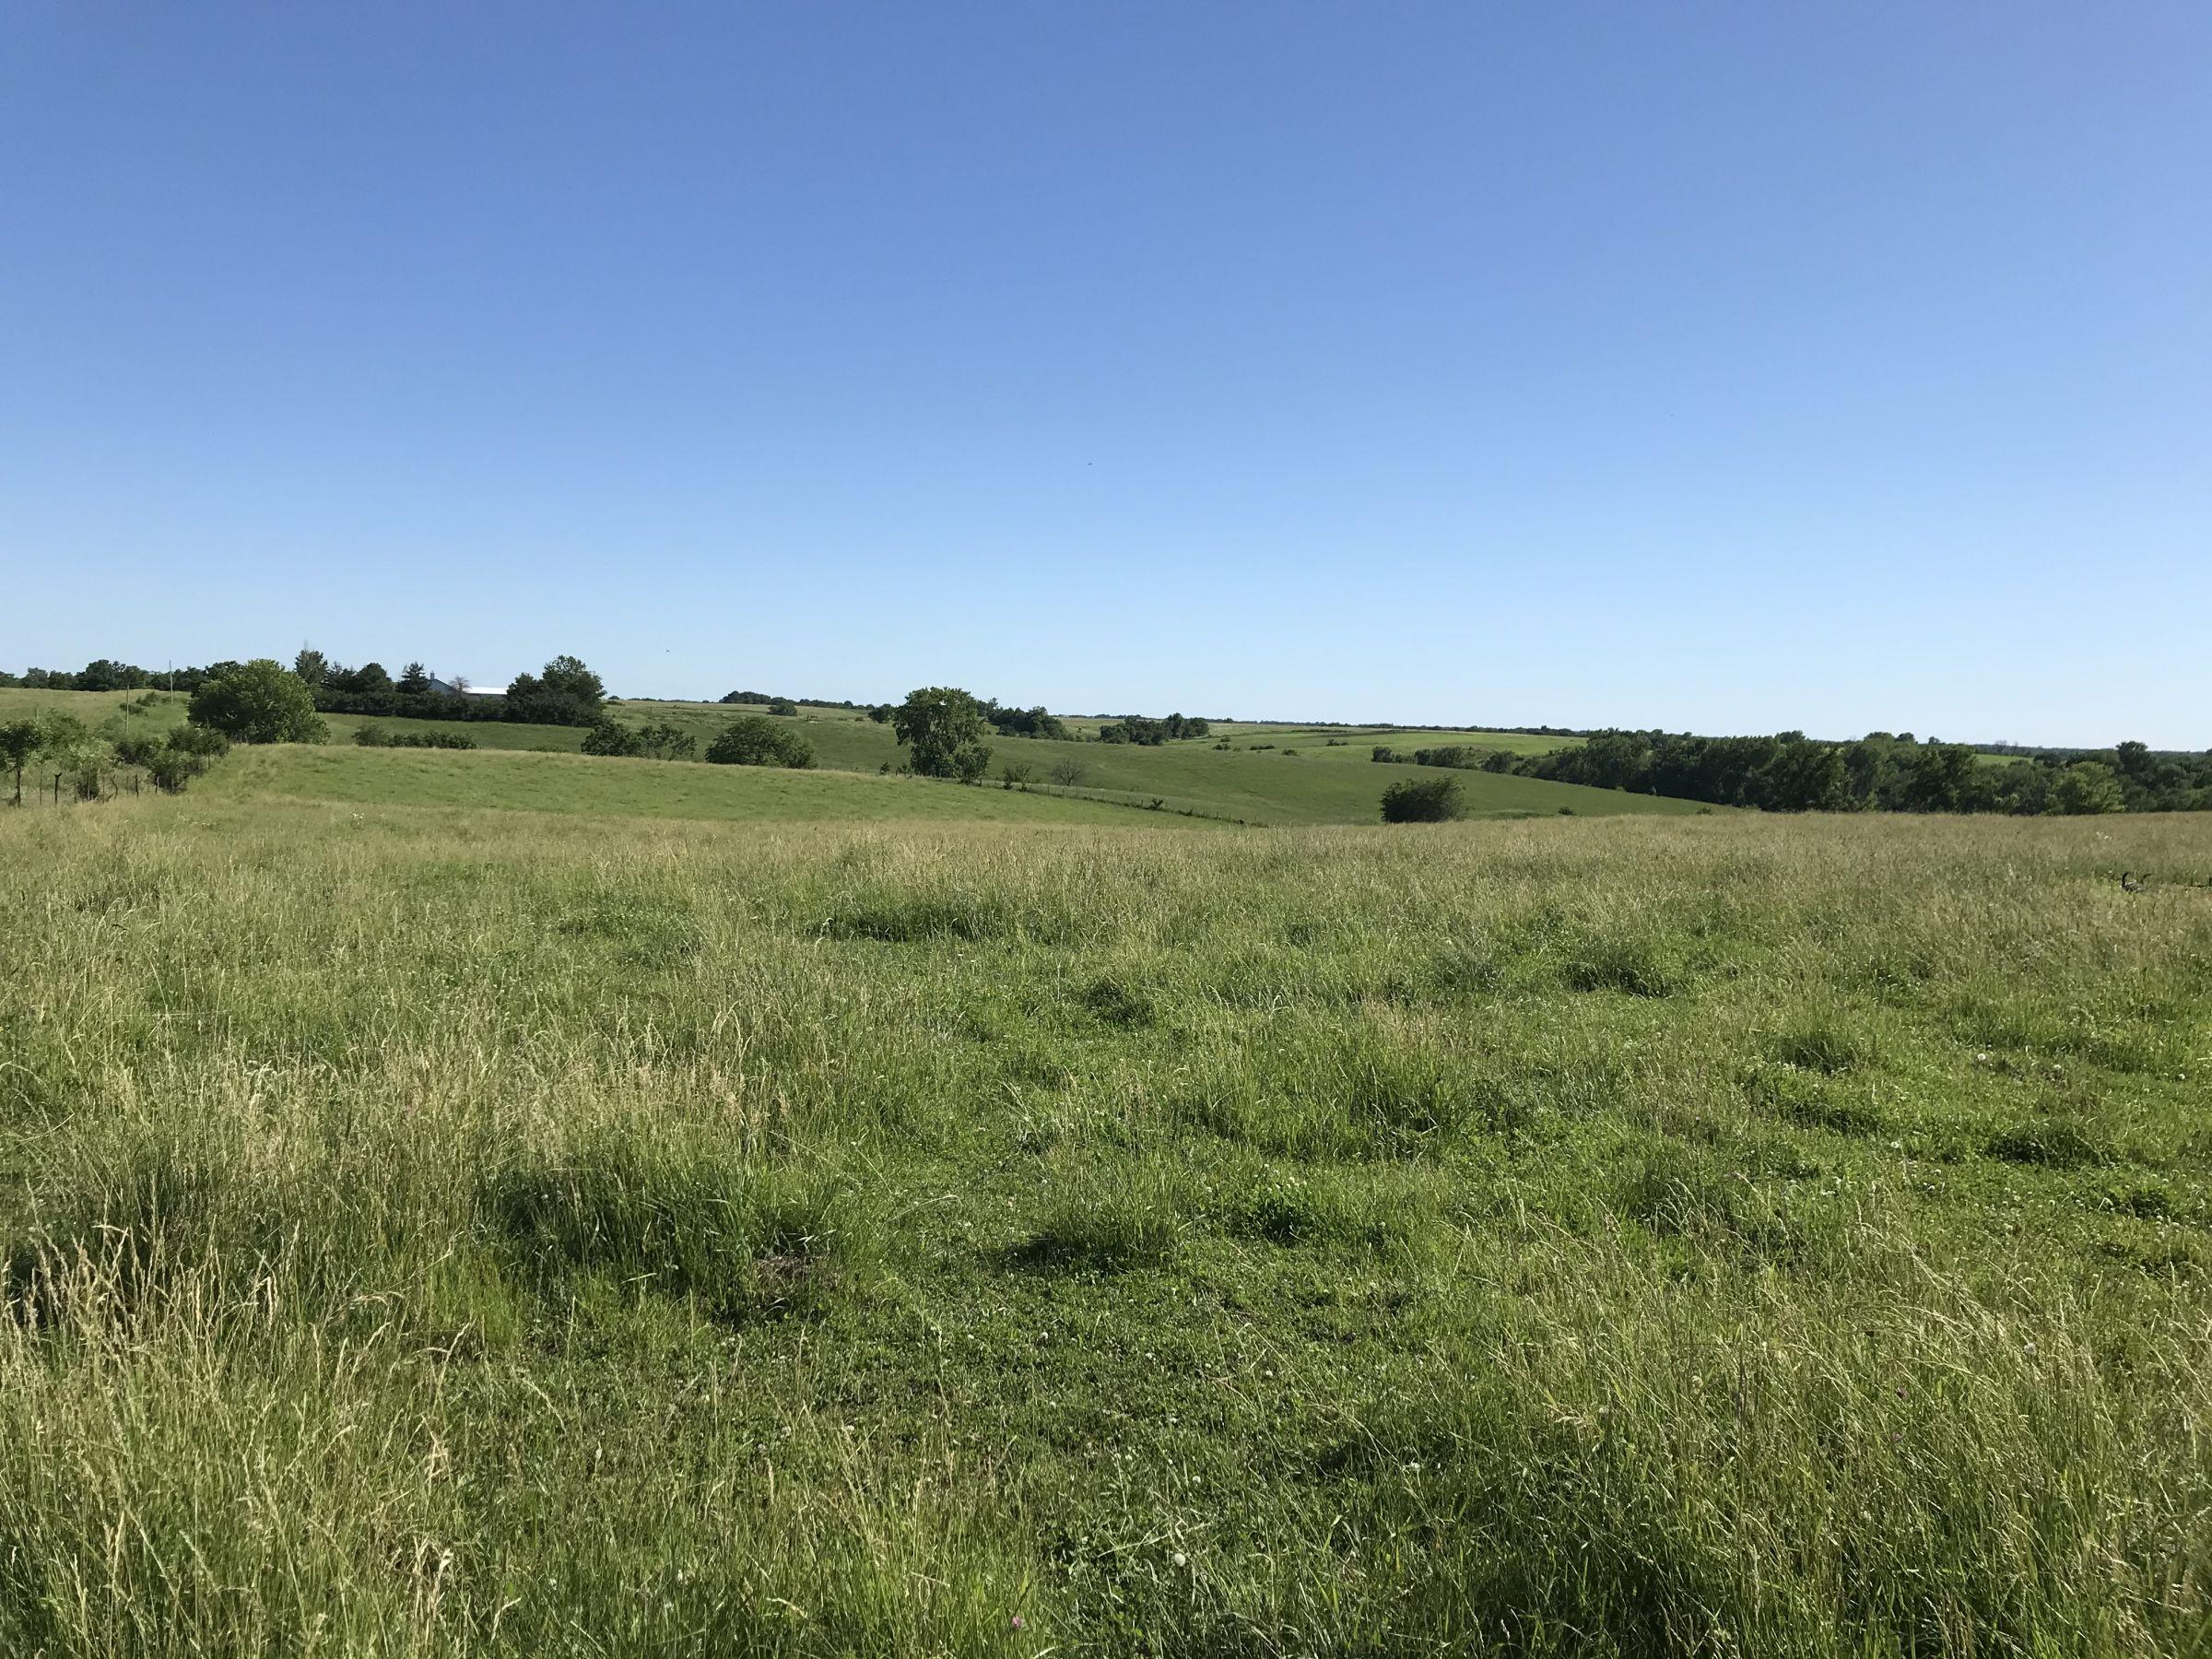 land-warren-county-iowa-20-acres-listing-number-15031-1-2020-06-14-152200.JPG